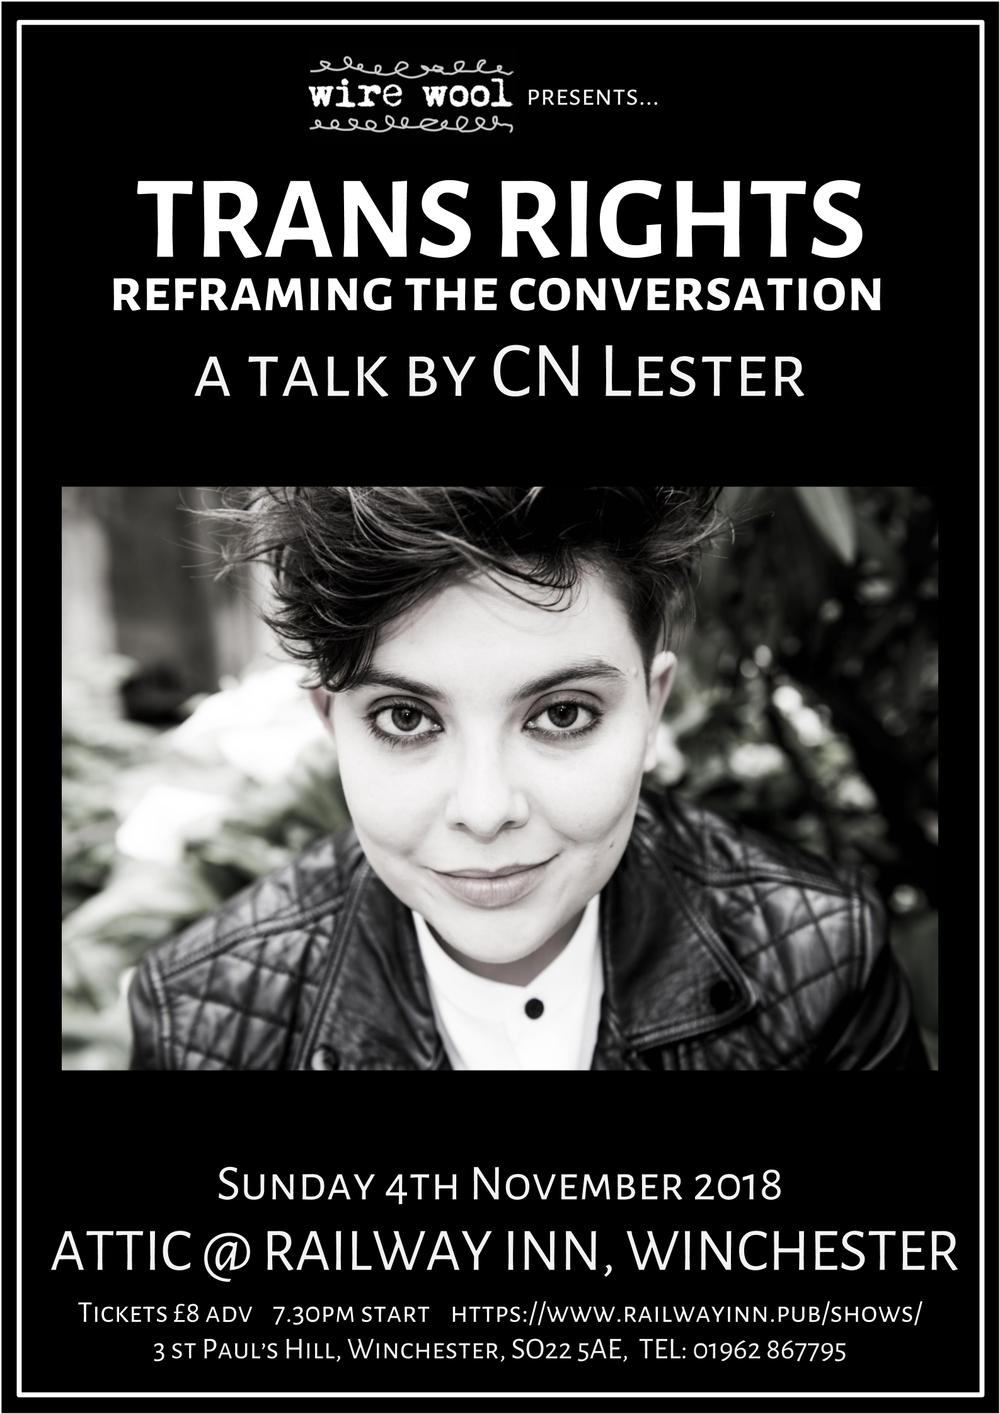 Trans Rights - Reframing the Conversation: a talk by CN Lester Sunday November 4 2018